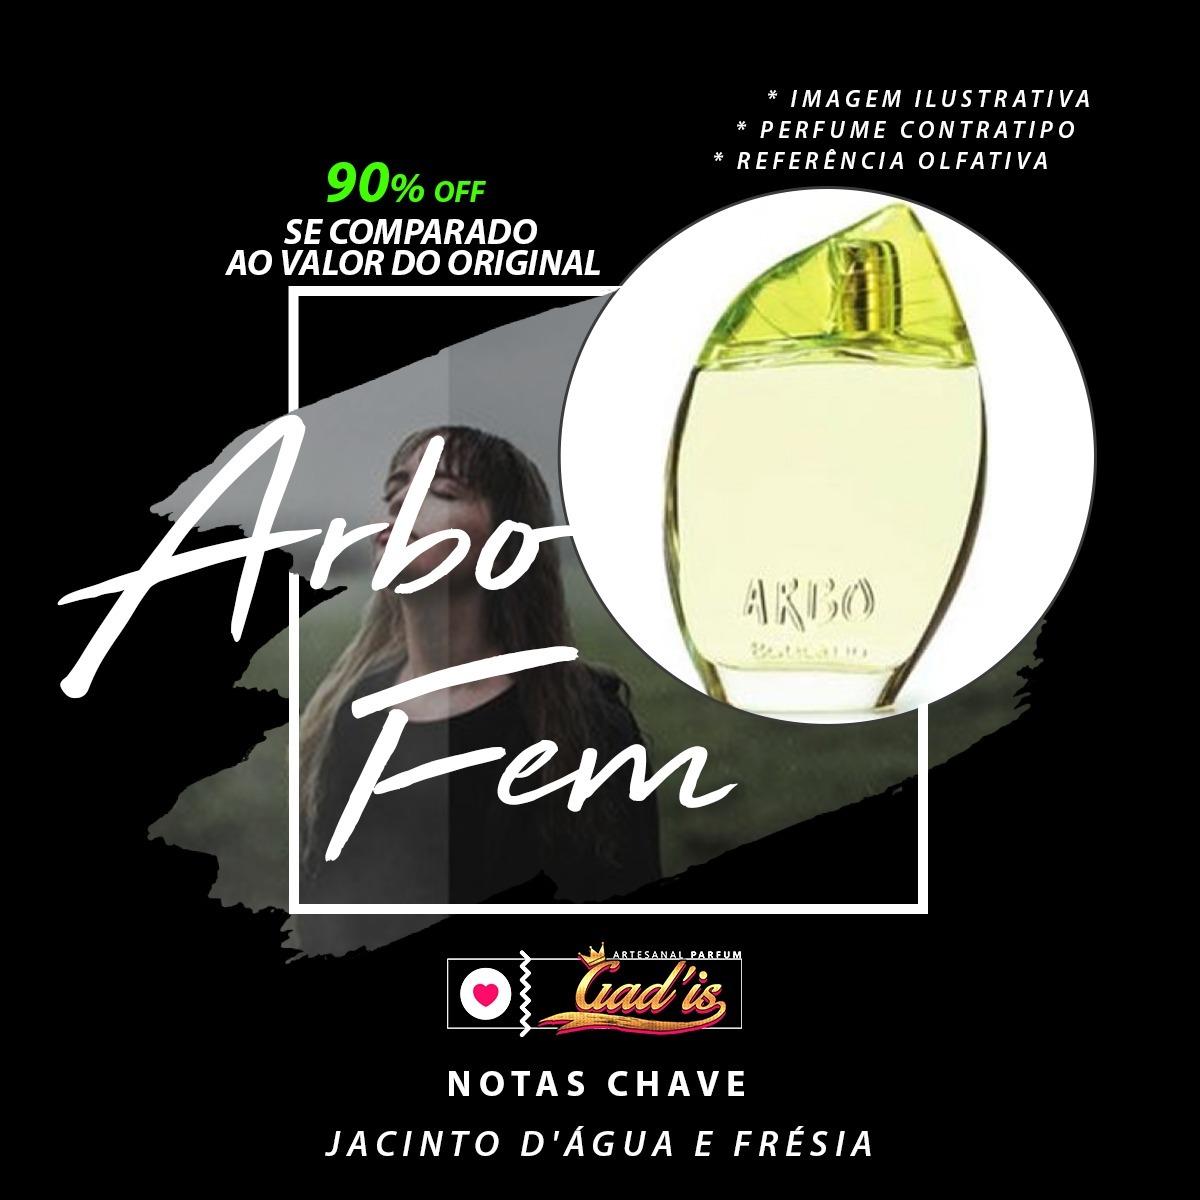 6a63f8eade9 Perfume Similar N° 268 Inspirado Em Arbo Feminino 120ml - R  114